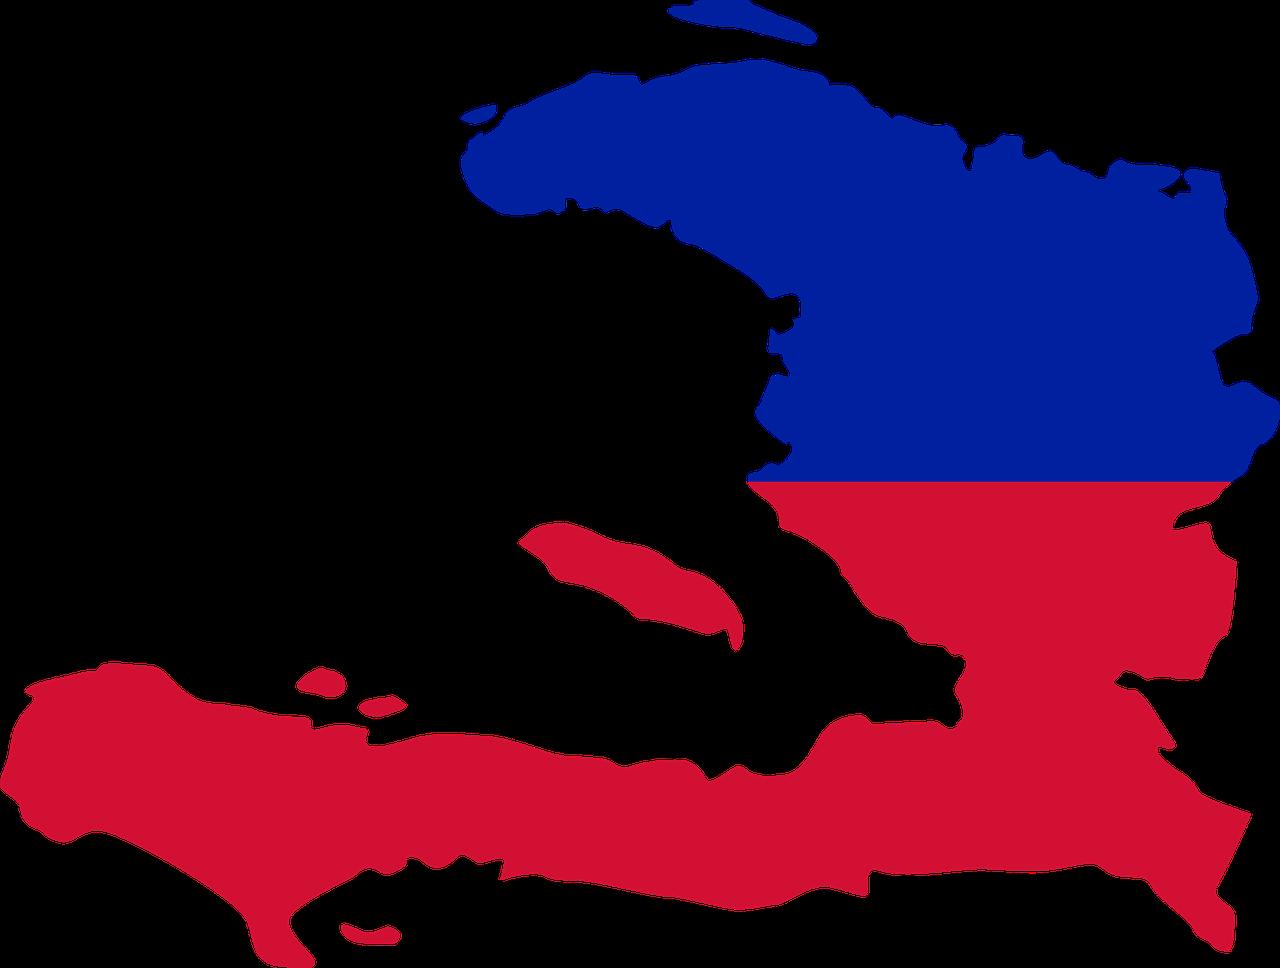 #Haiti 1804 Revolution BOSS Jean Jacques Dessalines